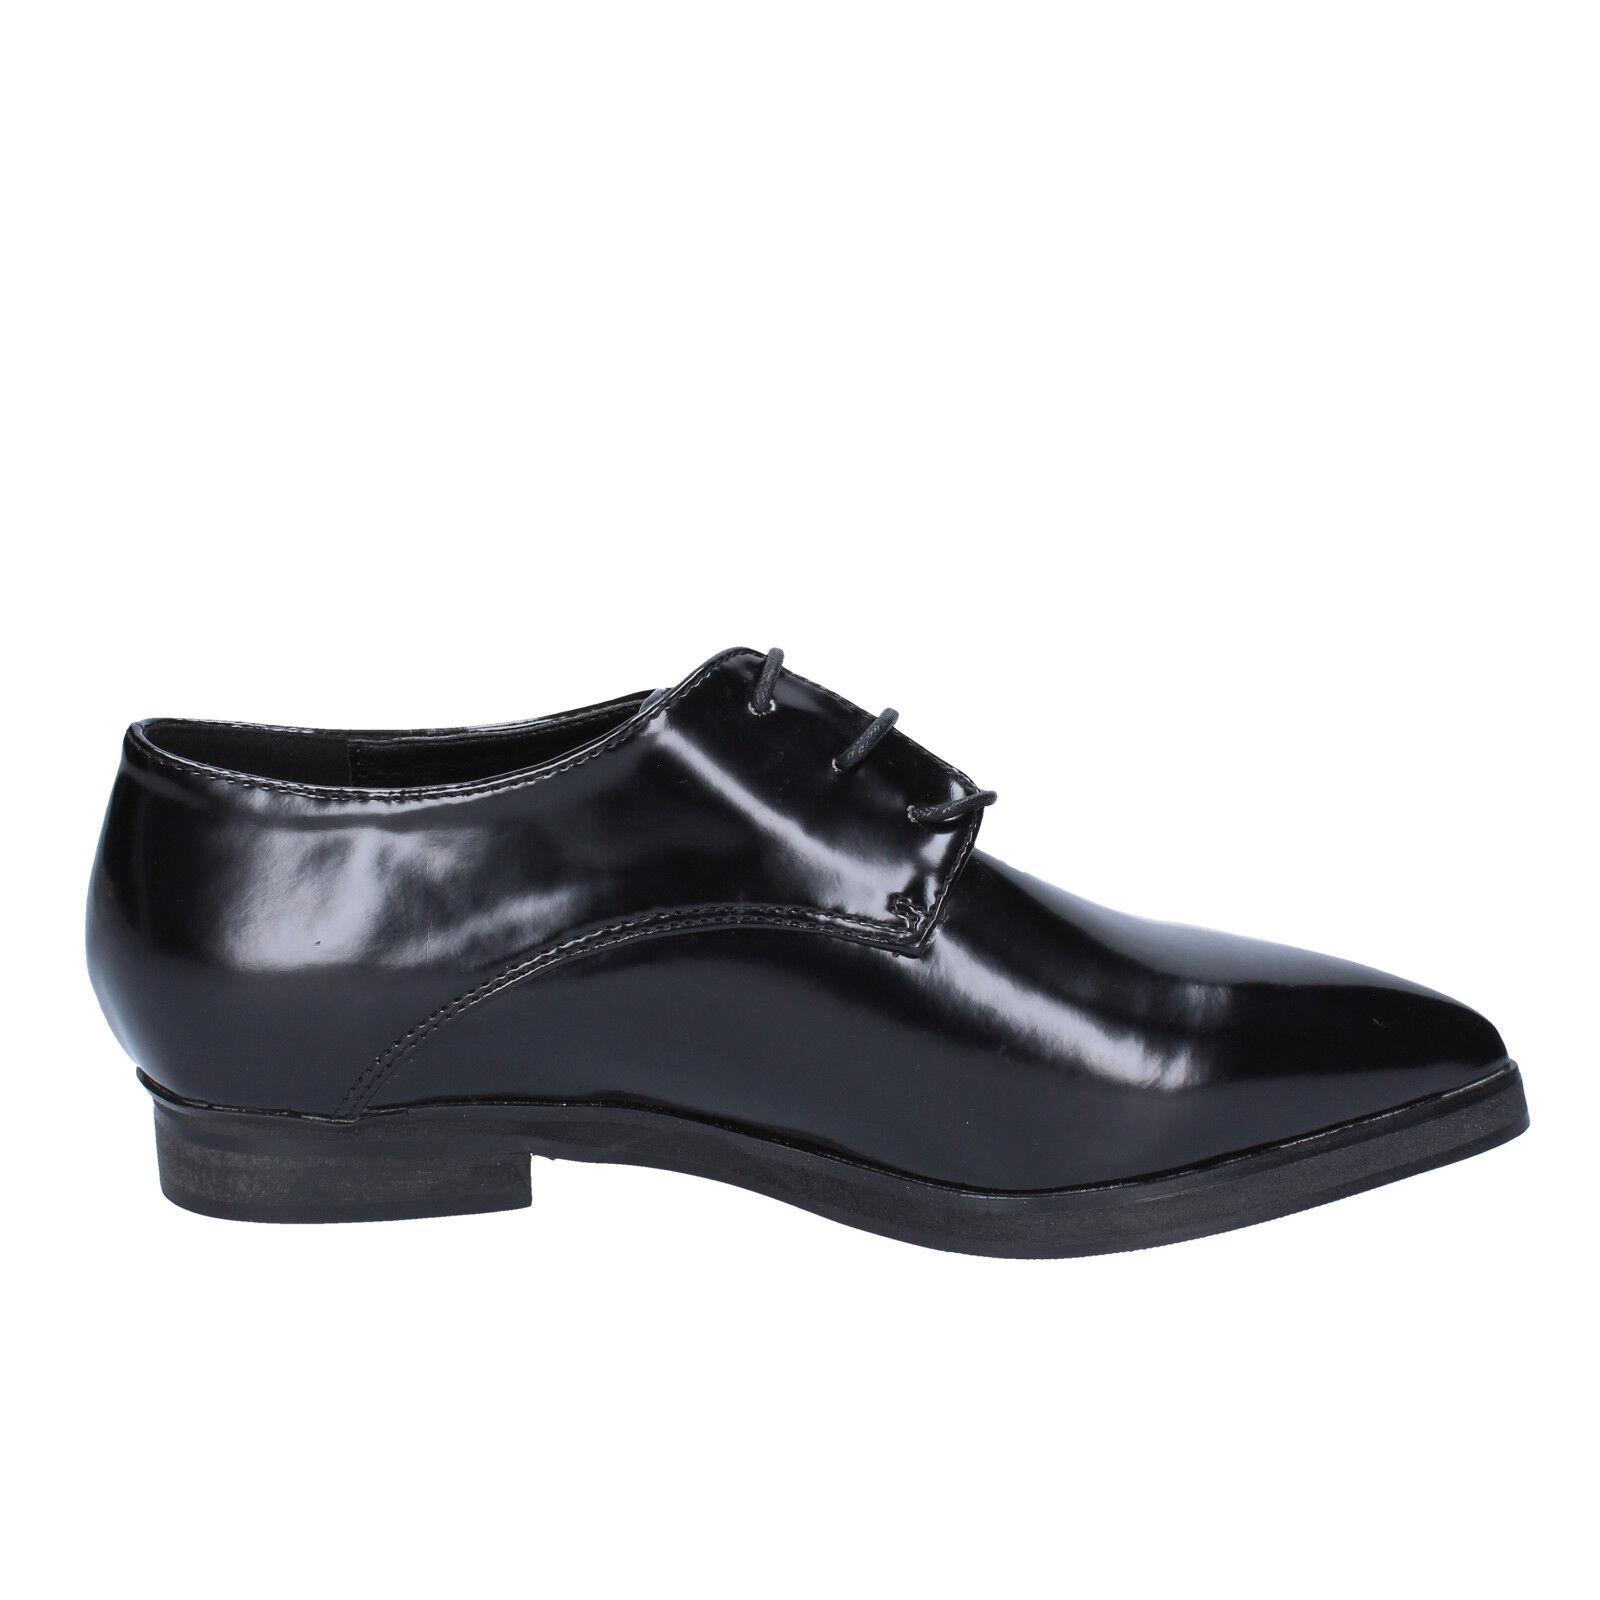 Scarpe Scarpe Scarpe donna FRANCESCO MILANO 37 elegante pelle nera bx328-37 111e62